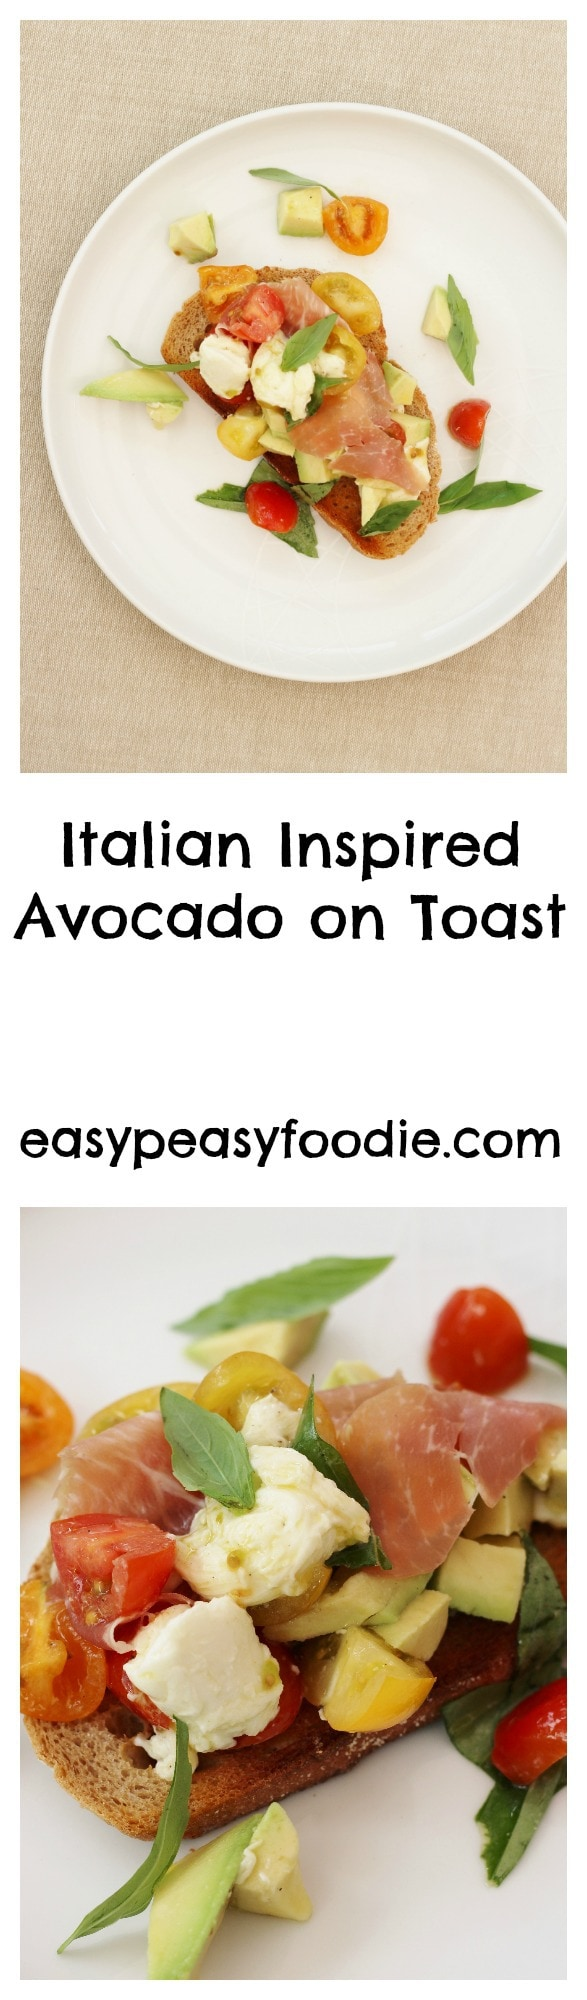 Italian Style Avocado Toast - pinnable image for Pinterest